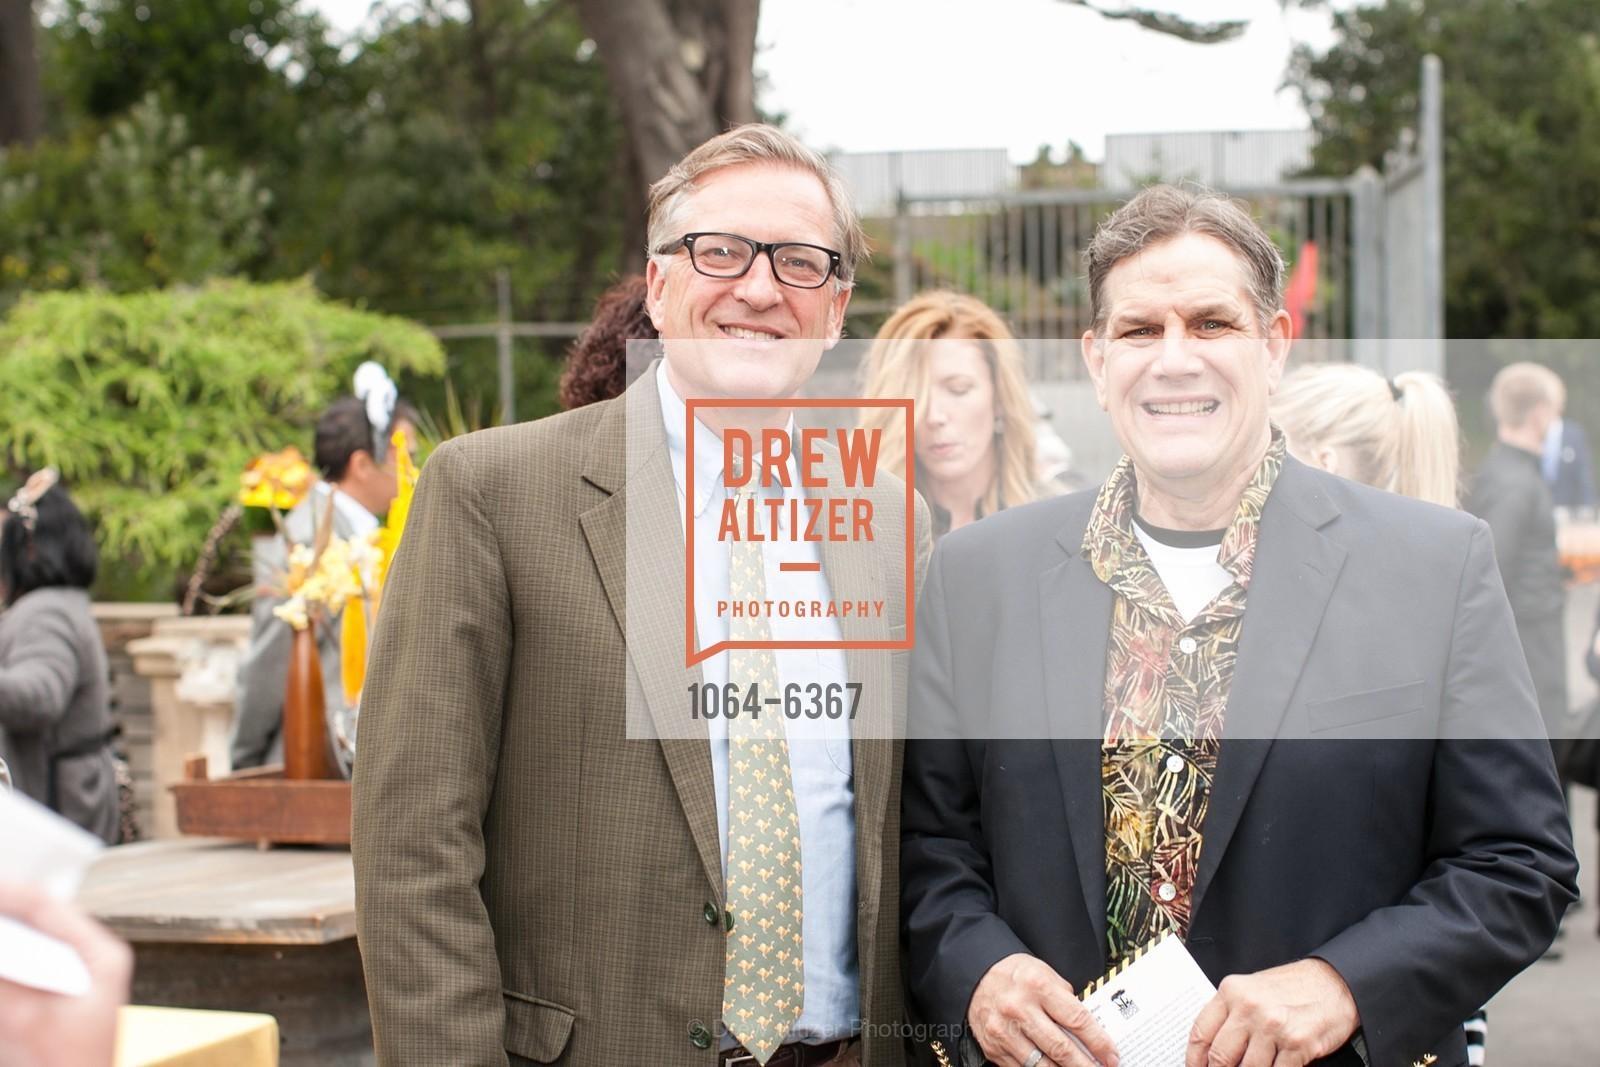 Mark Lerdal, Bill Hudson, ZooFest 2013 Hard Hat & Tails, US, May 11th, 2013